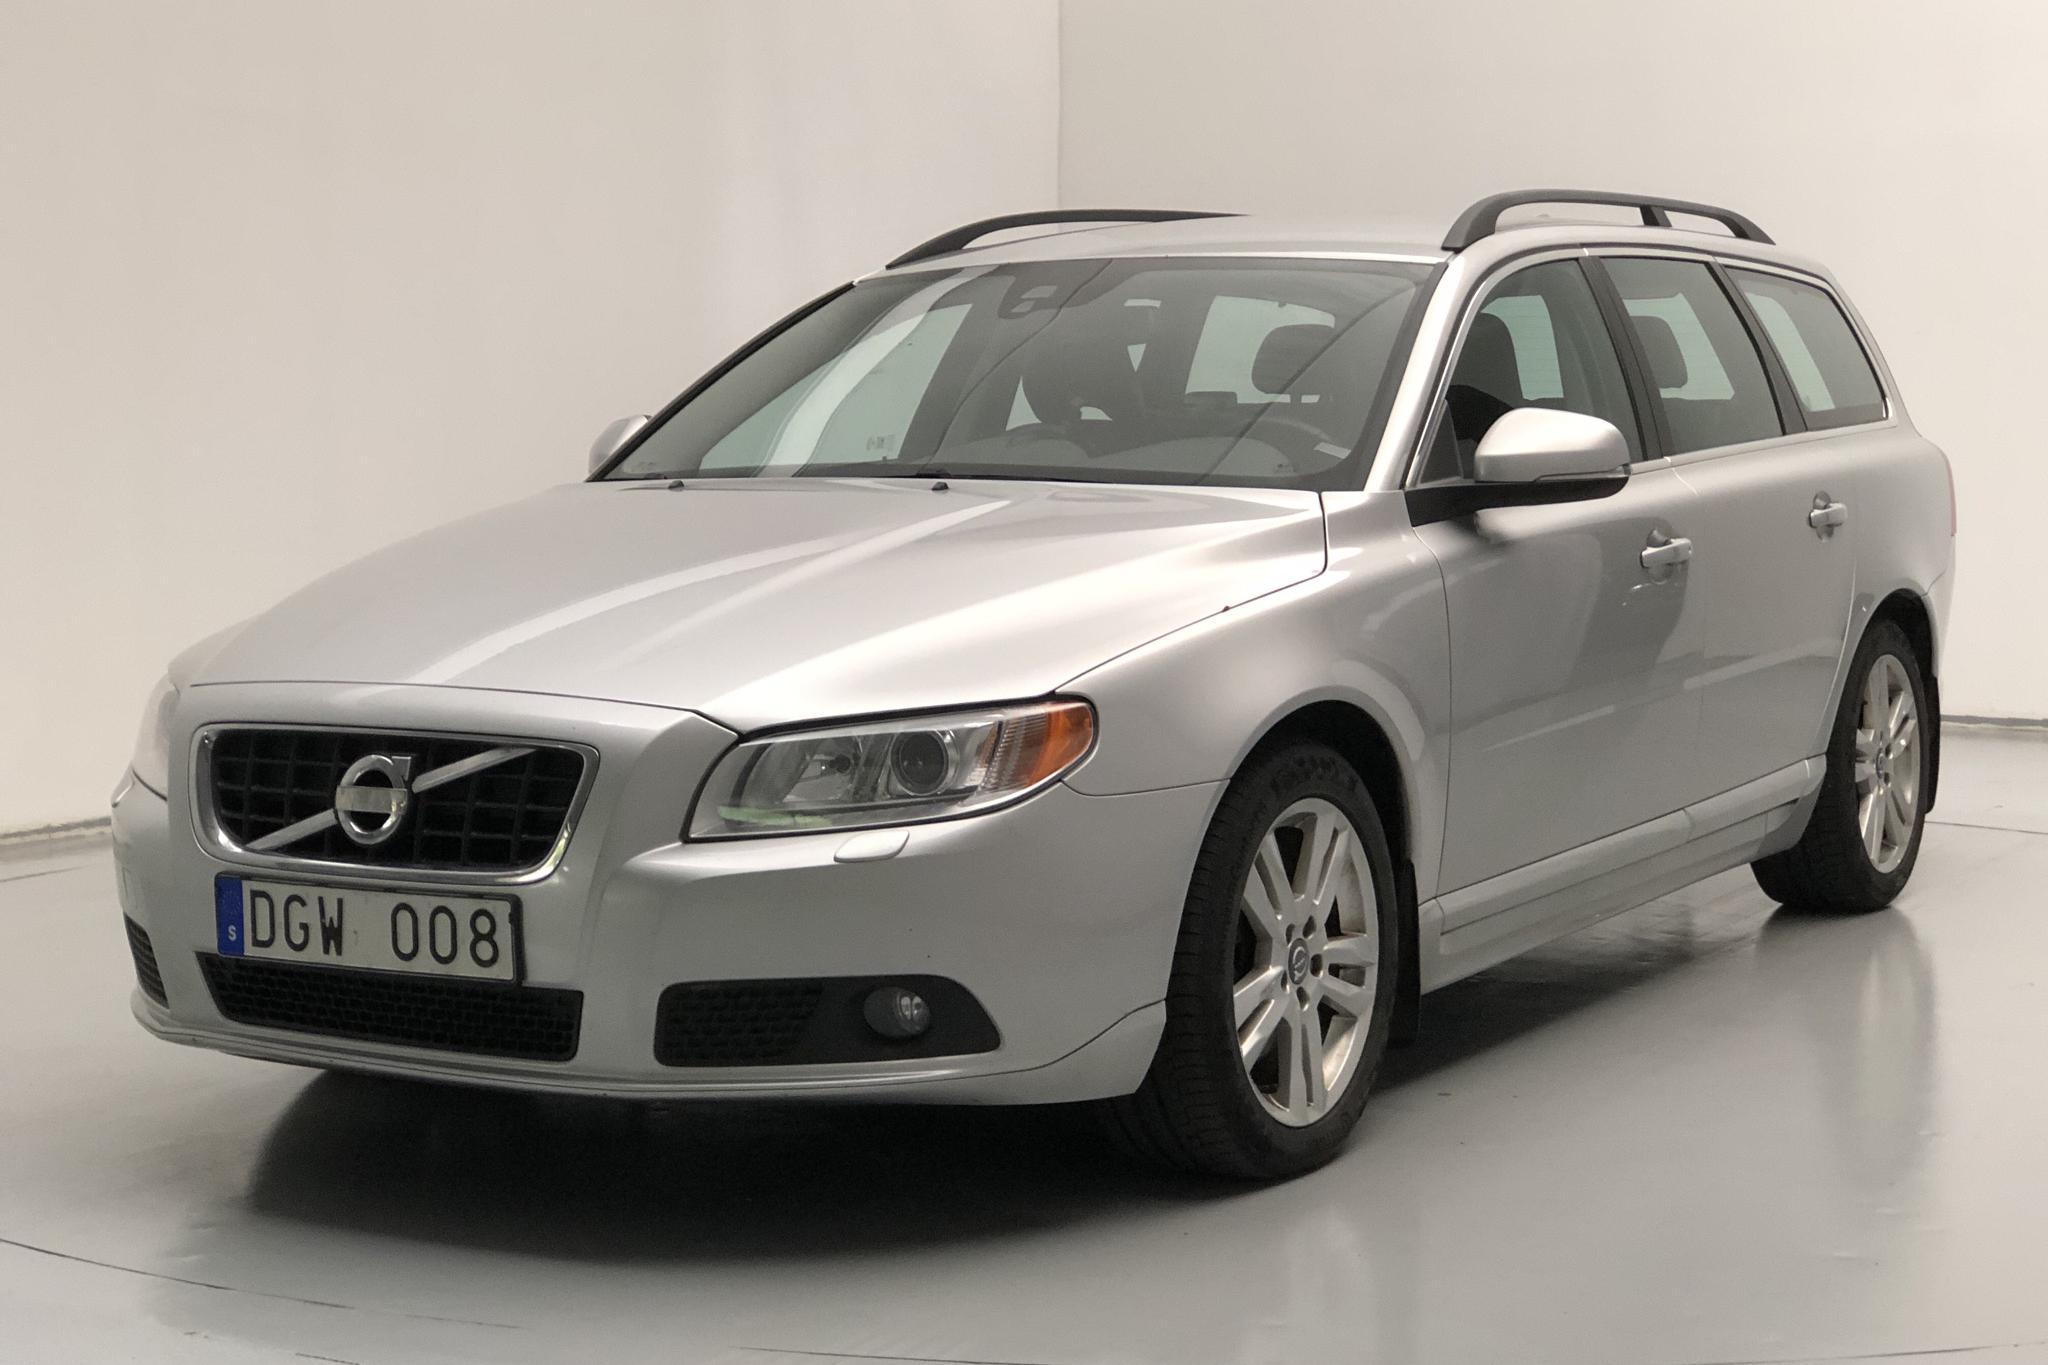 Volvo V70 II D4 (163hk) - 22 724 mil - Manuell - Light Grey - 2013